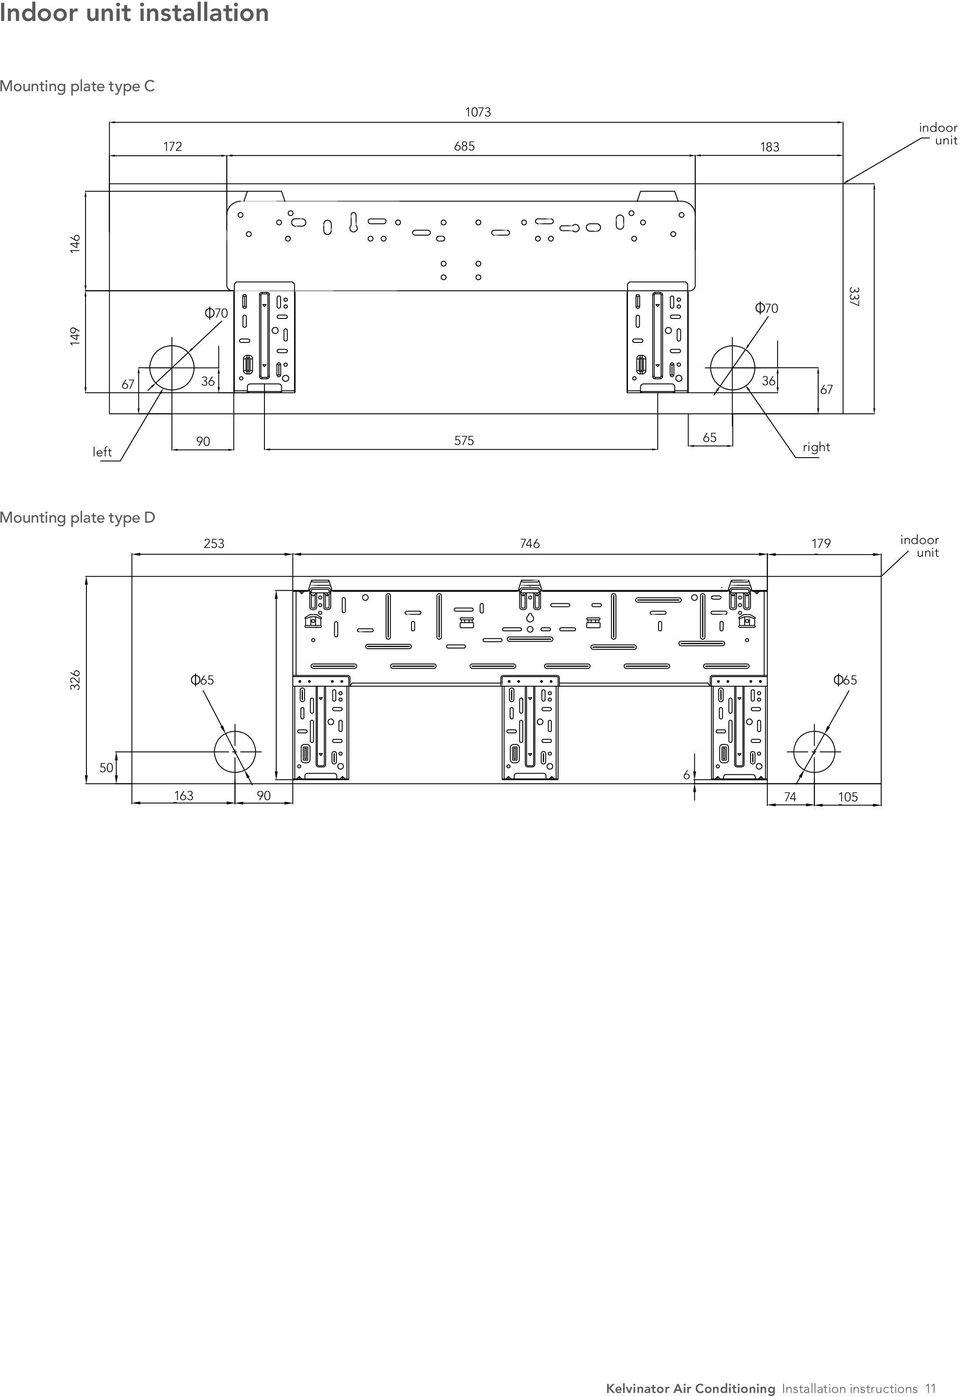 medium resolution of kelvinator air conditioning installation instructions 11 mounting plate type d 253 746